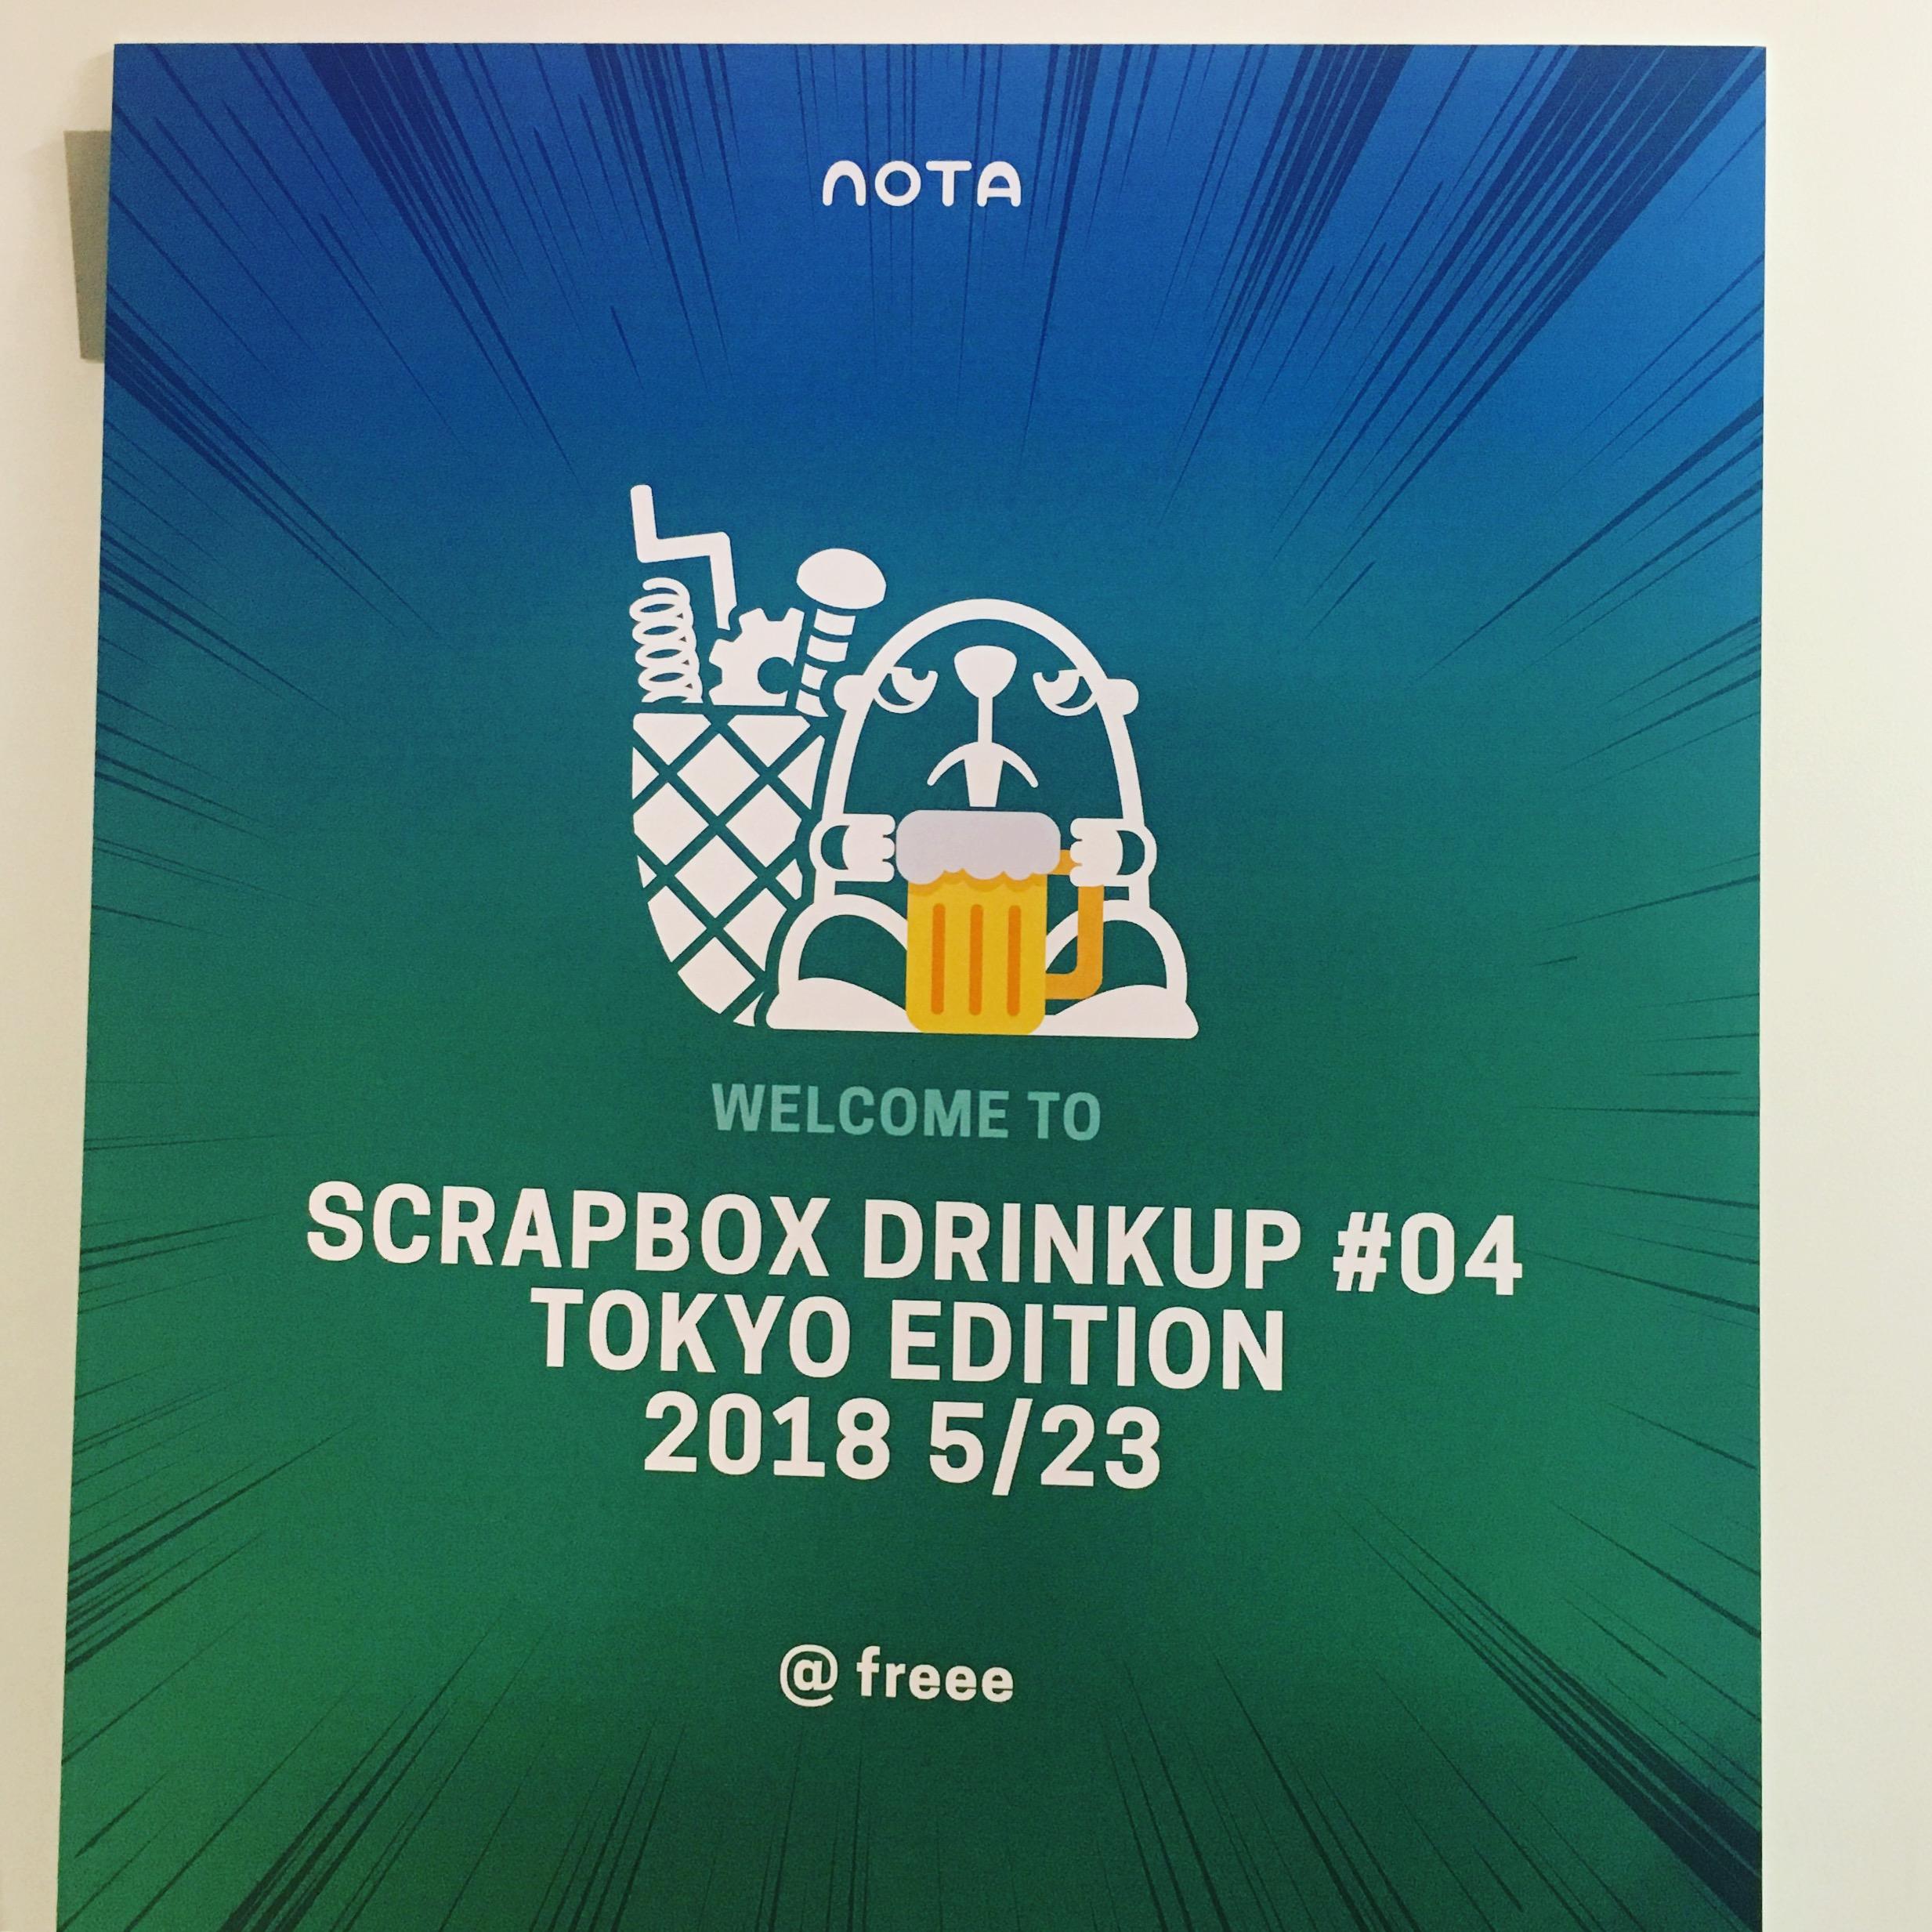 Scrapbox Drinkup #04 TOKYO EDITION